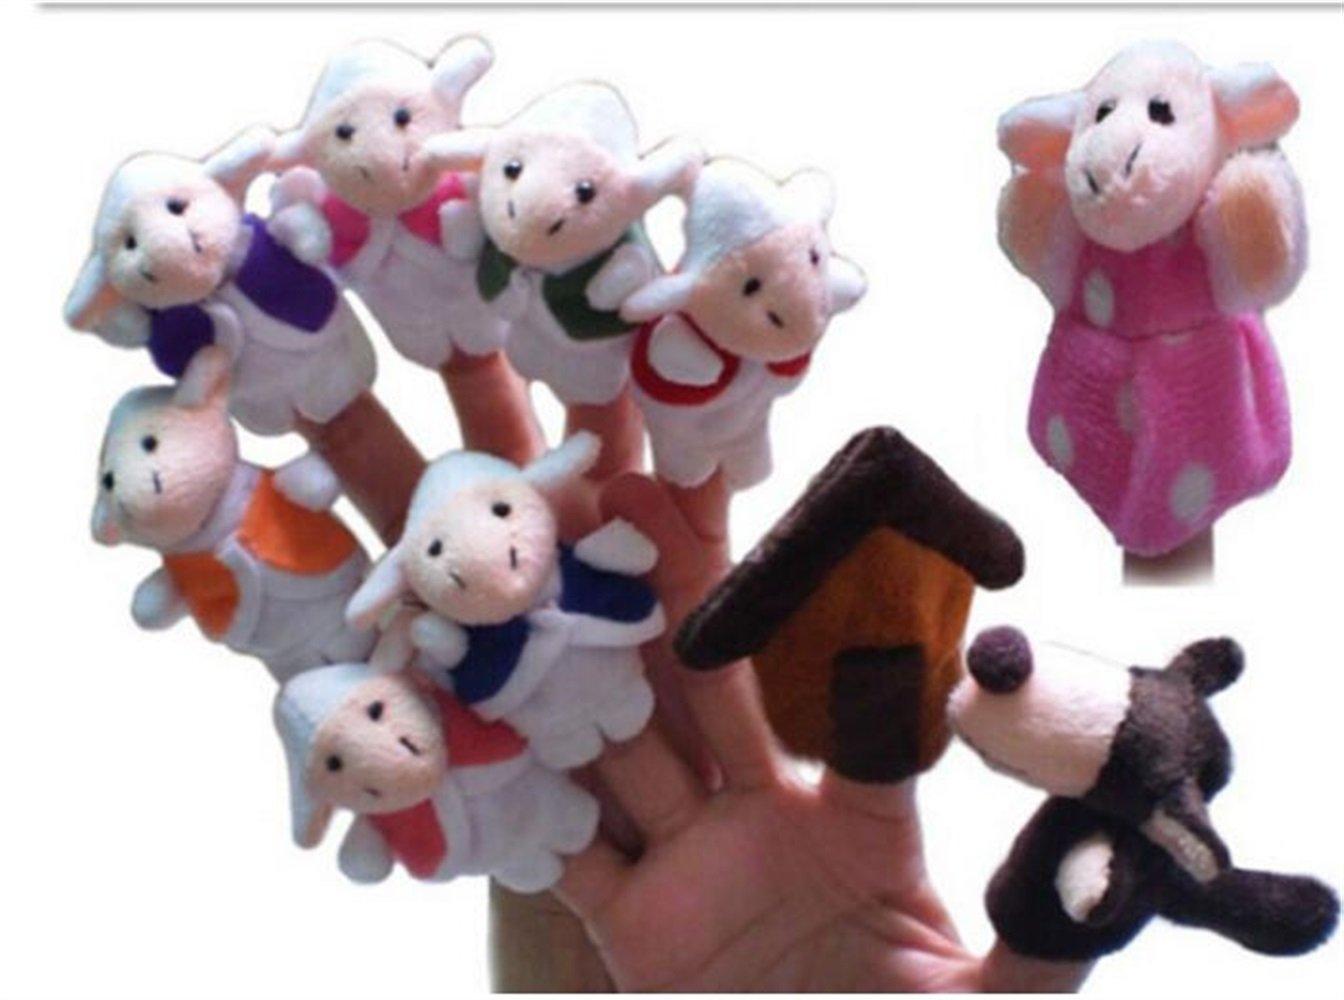 EoamIk Burattini Set of Ten PCS Peluche Finger Puppets Storia del Lupo e 7 agnelli